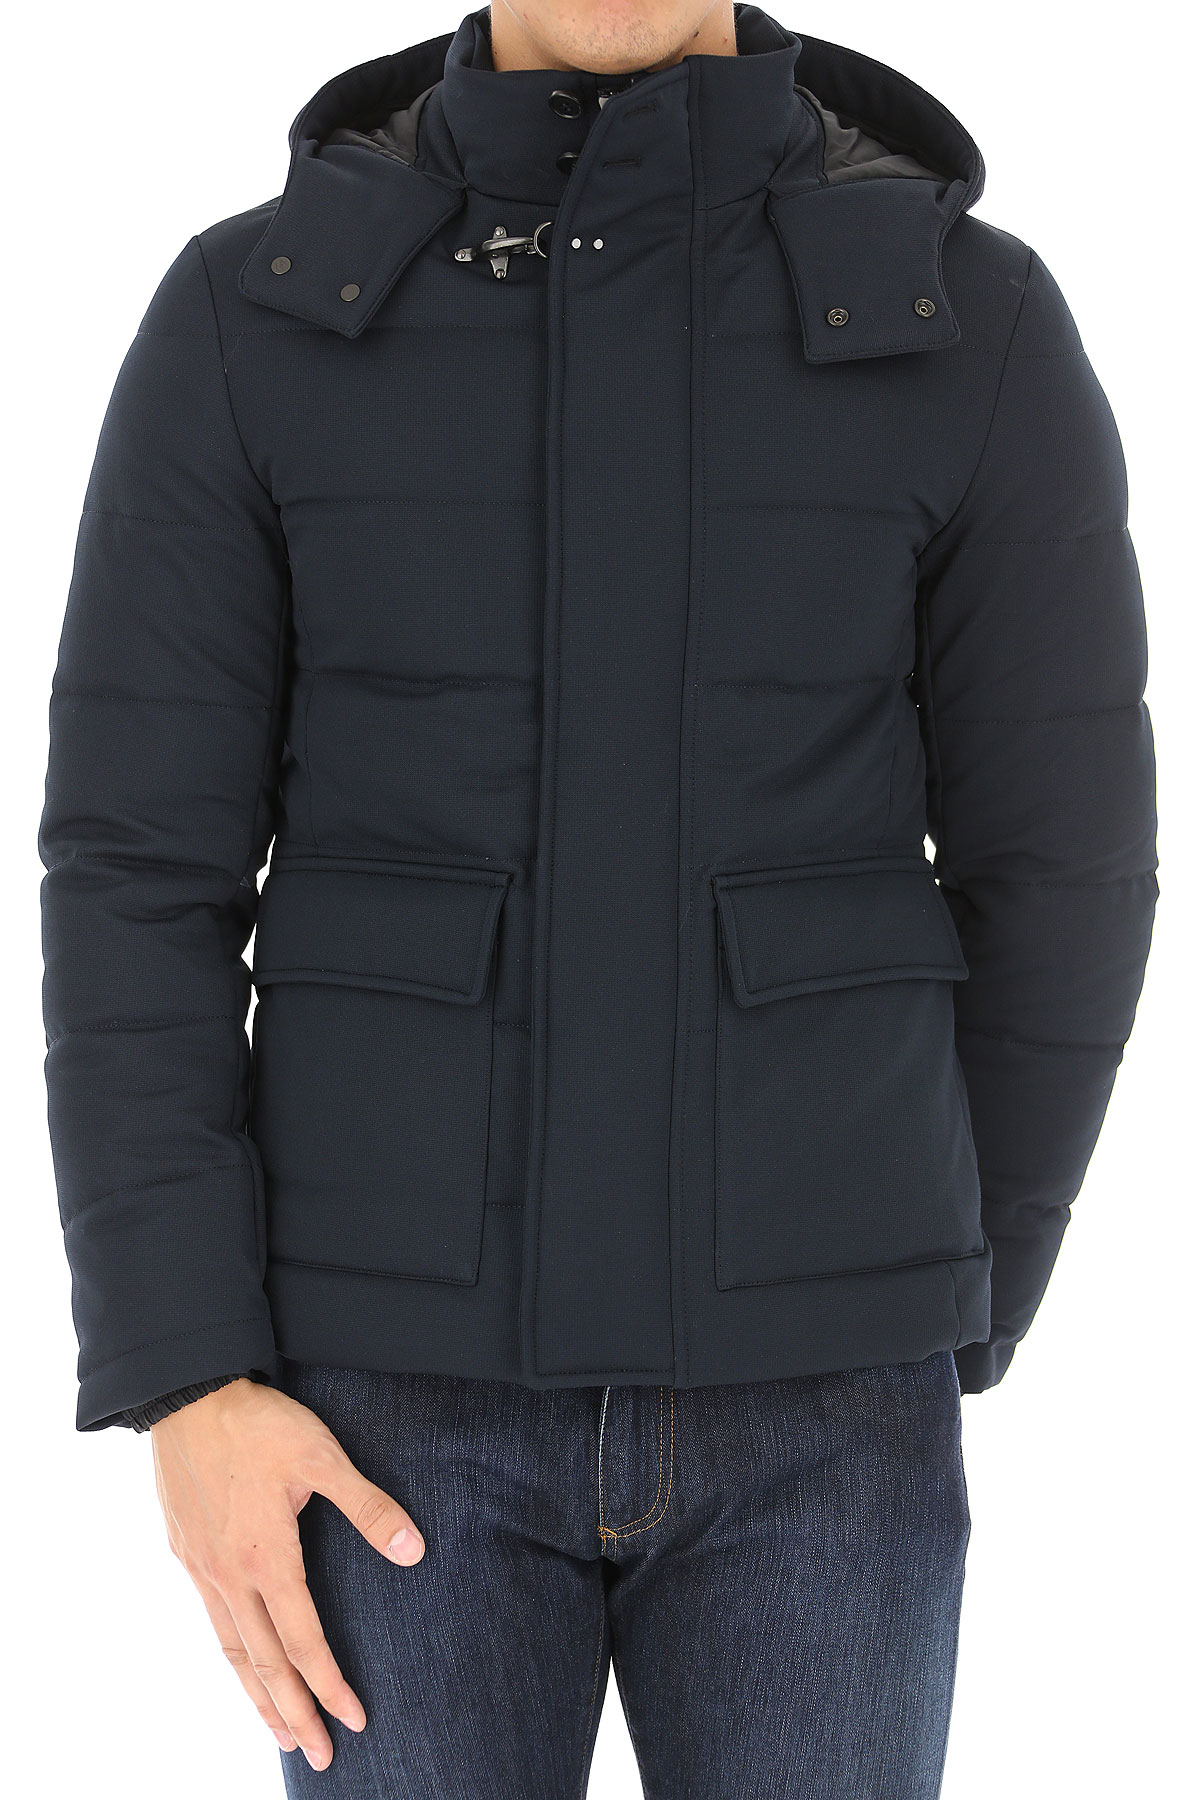 Image of Fay Blazer for Men, Sport Coat, Navy Blue, Wool, 2017, L M XL XXL XXXL